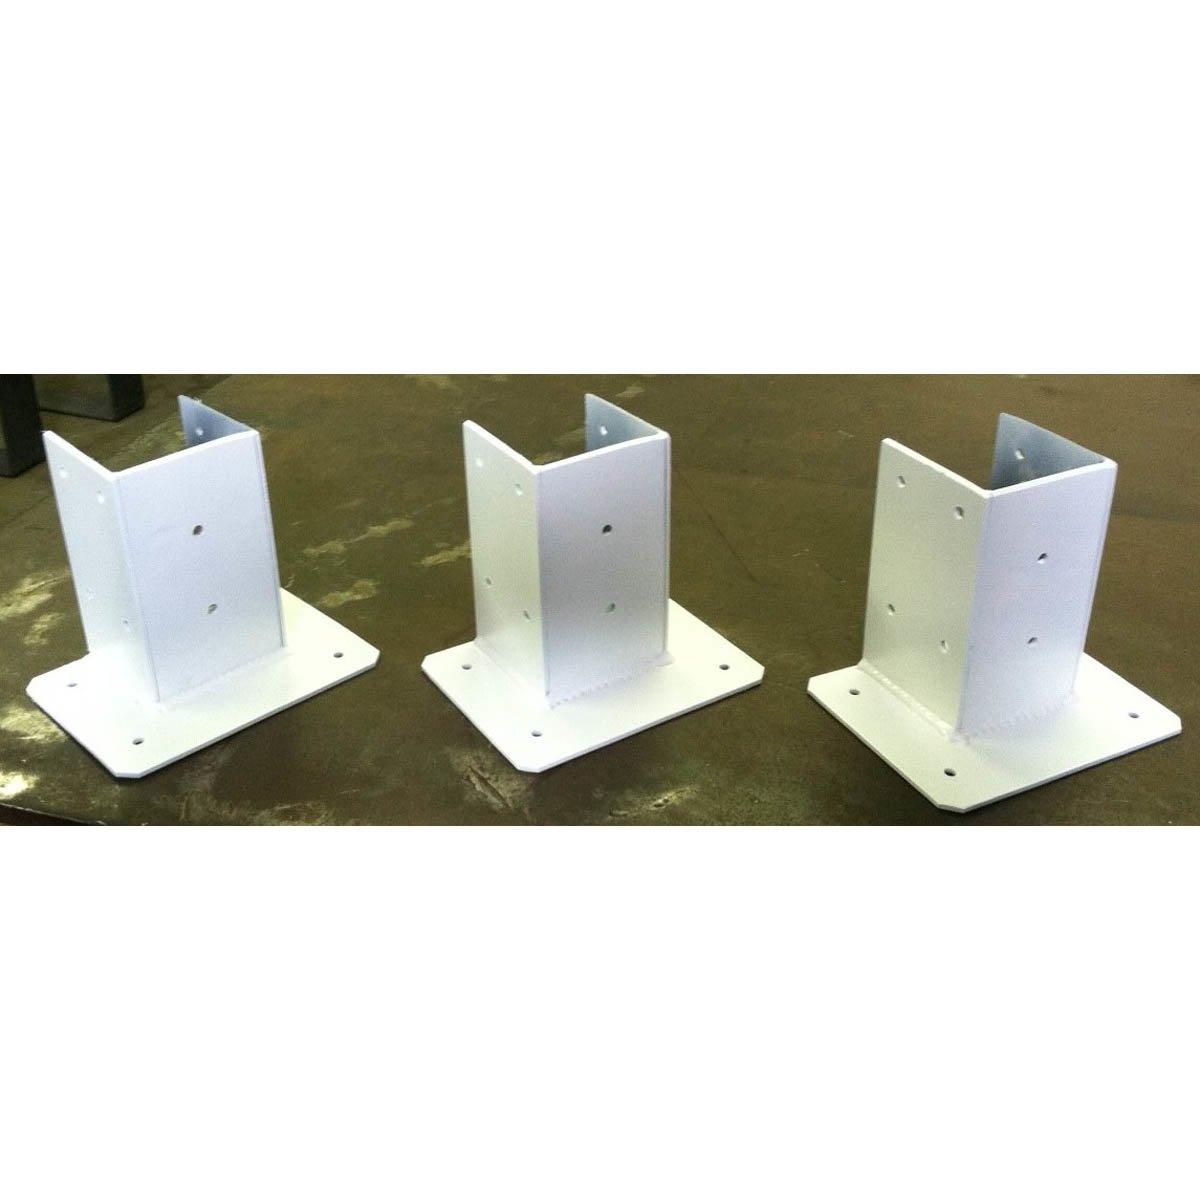 3 - Sided Wood Post Base Brackets Painted White